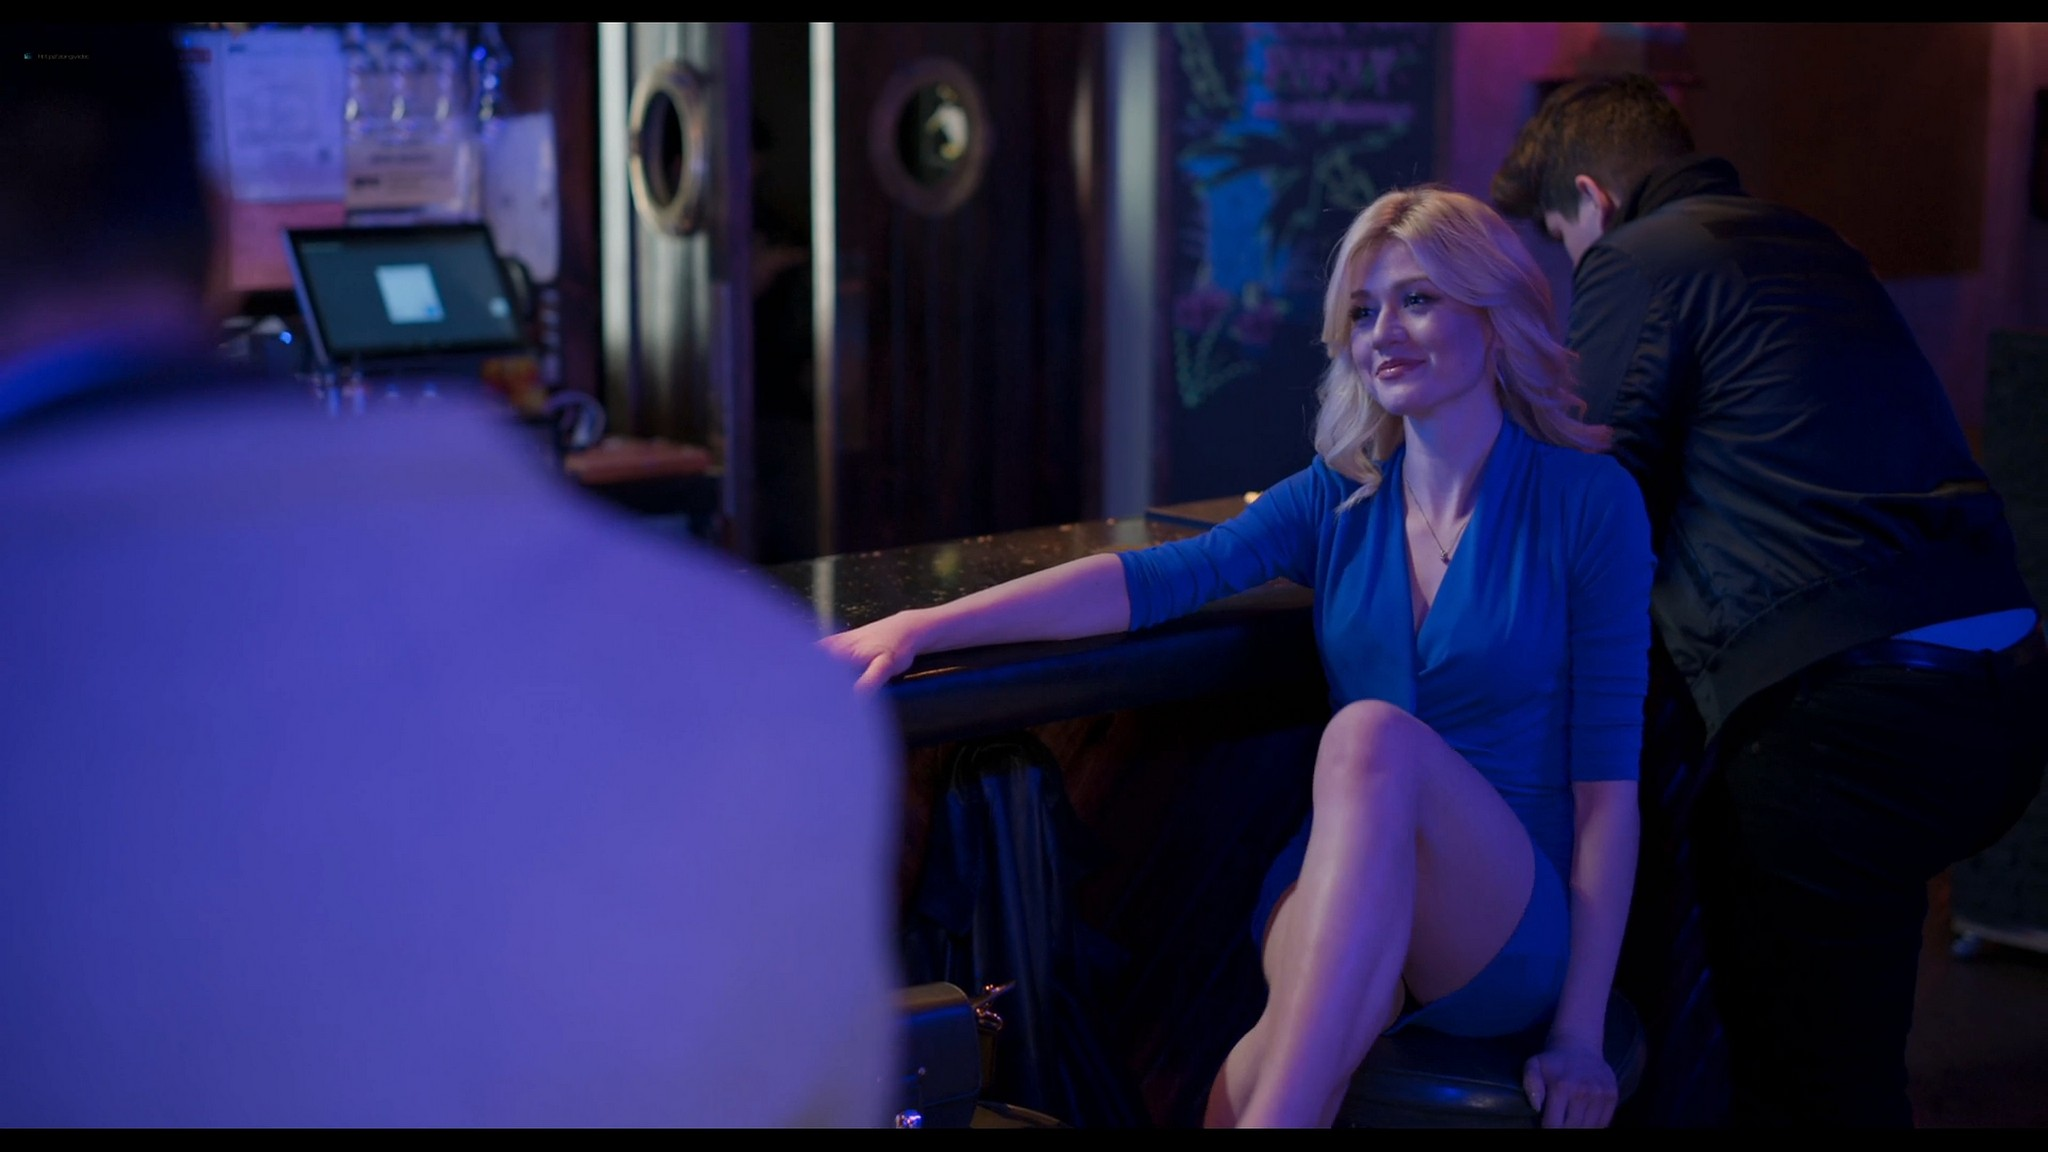 Victoria Justice hot Katherine McNamara sexy Trust 2021 1080p Web 3